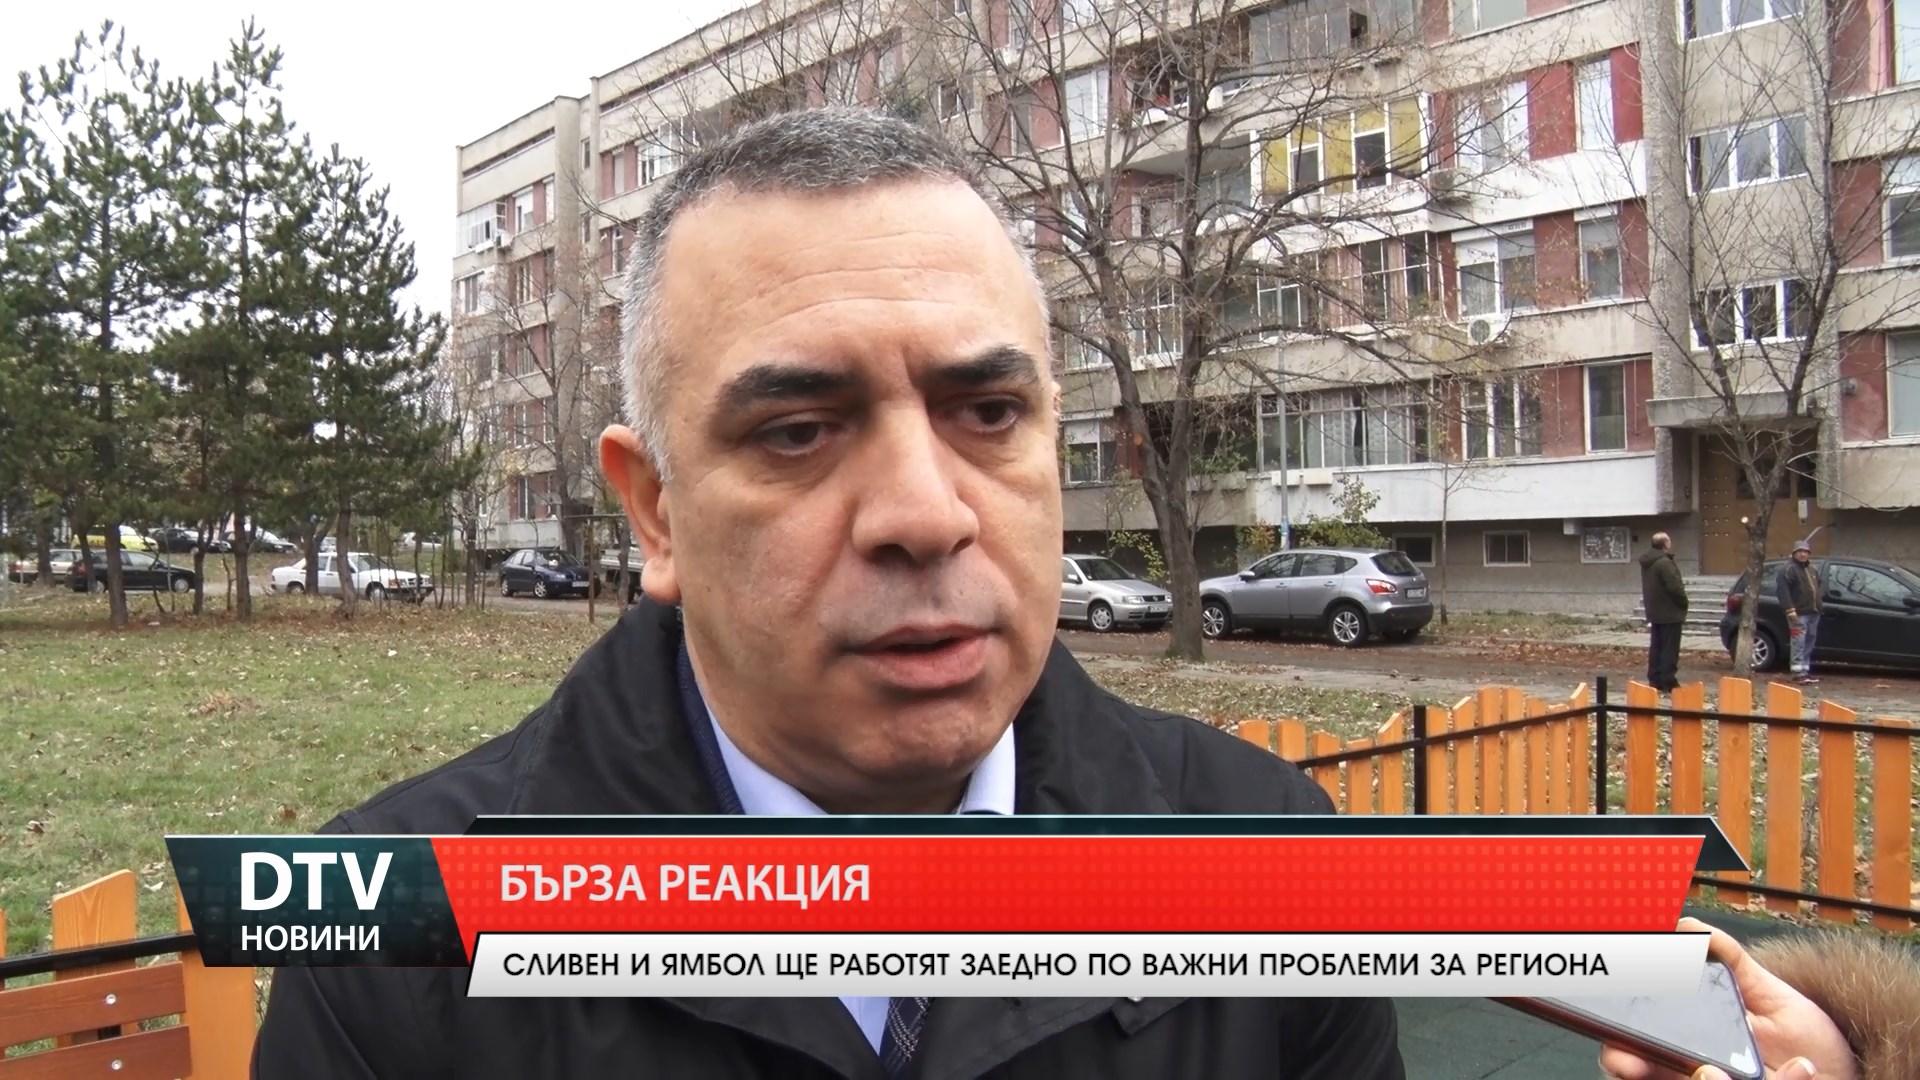 "Стефан Радев:""Сливен и Ямбол ще работят заедно по важни проблеми за региона"""